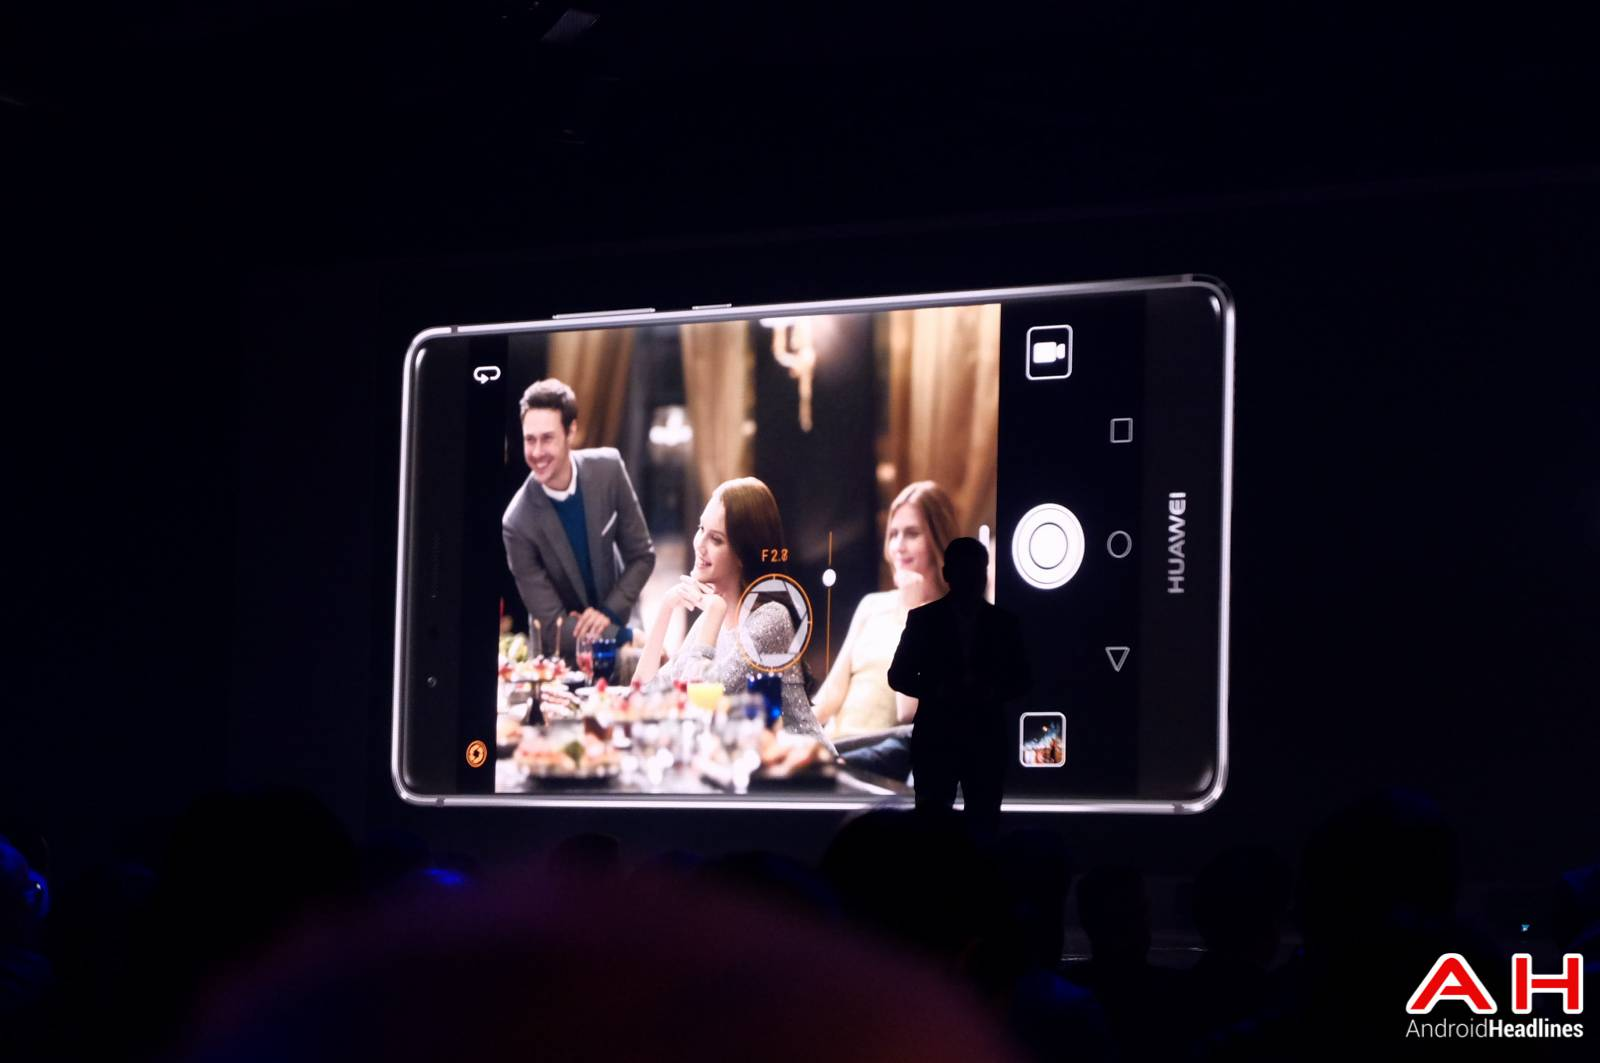 Huawei P9 Event 6 AH 0391